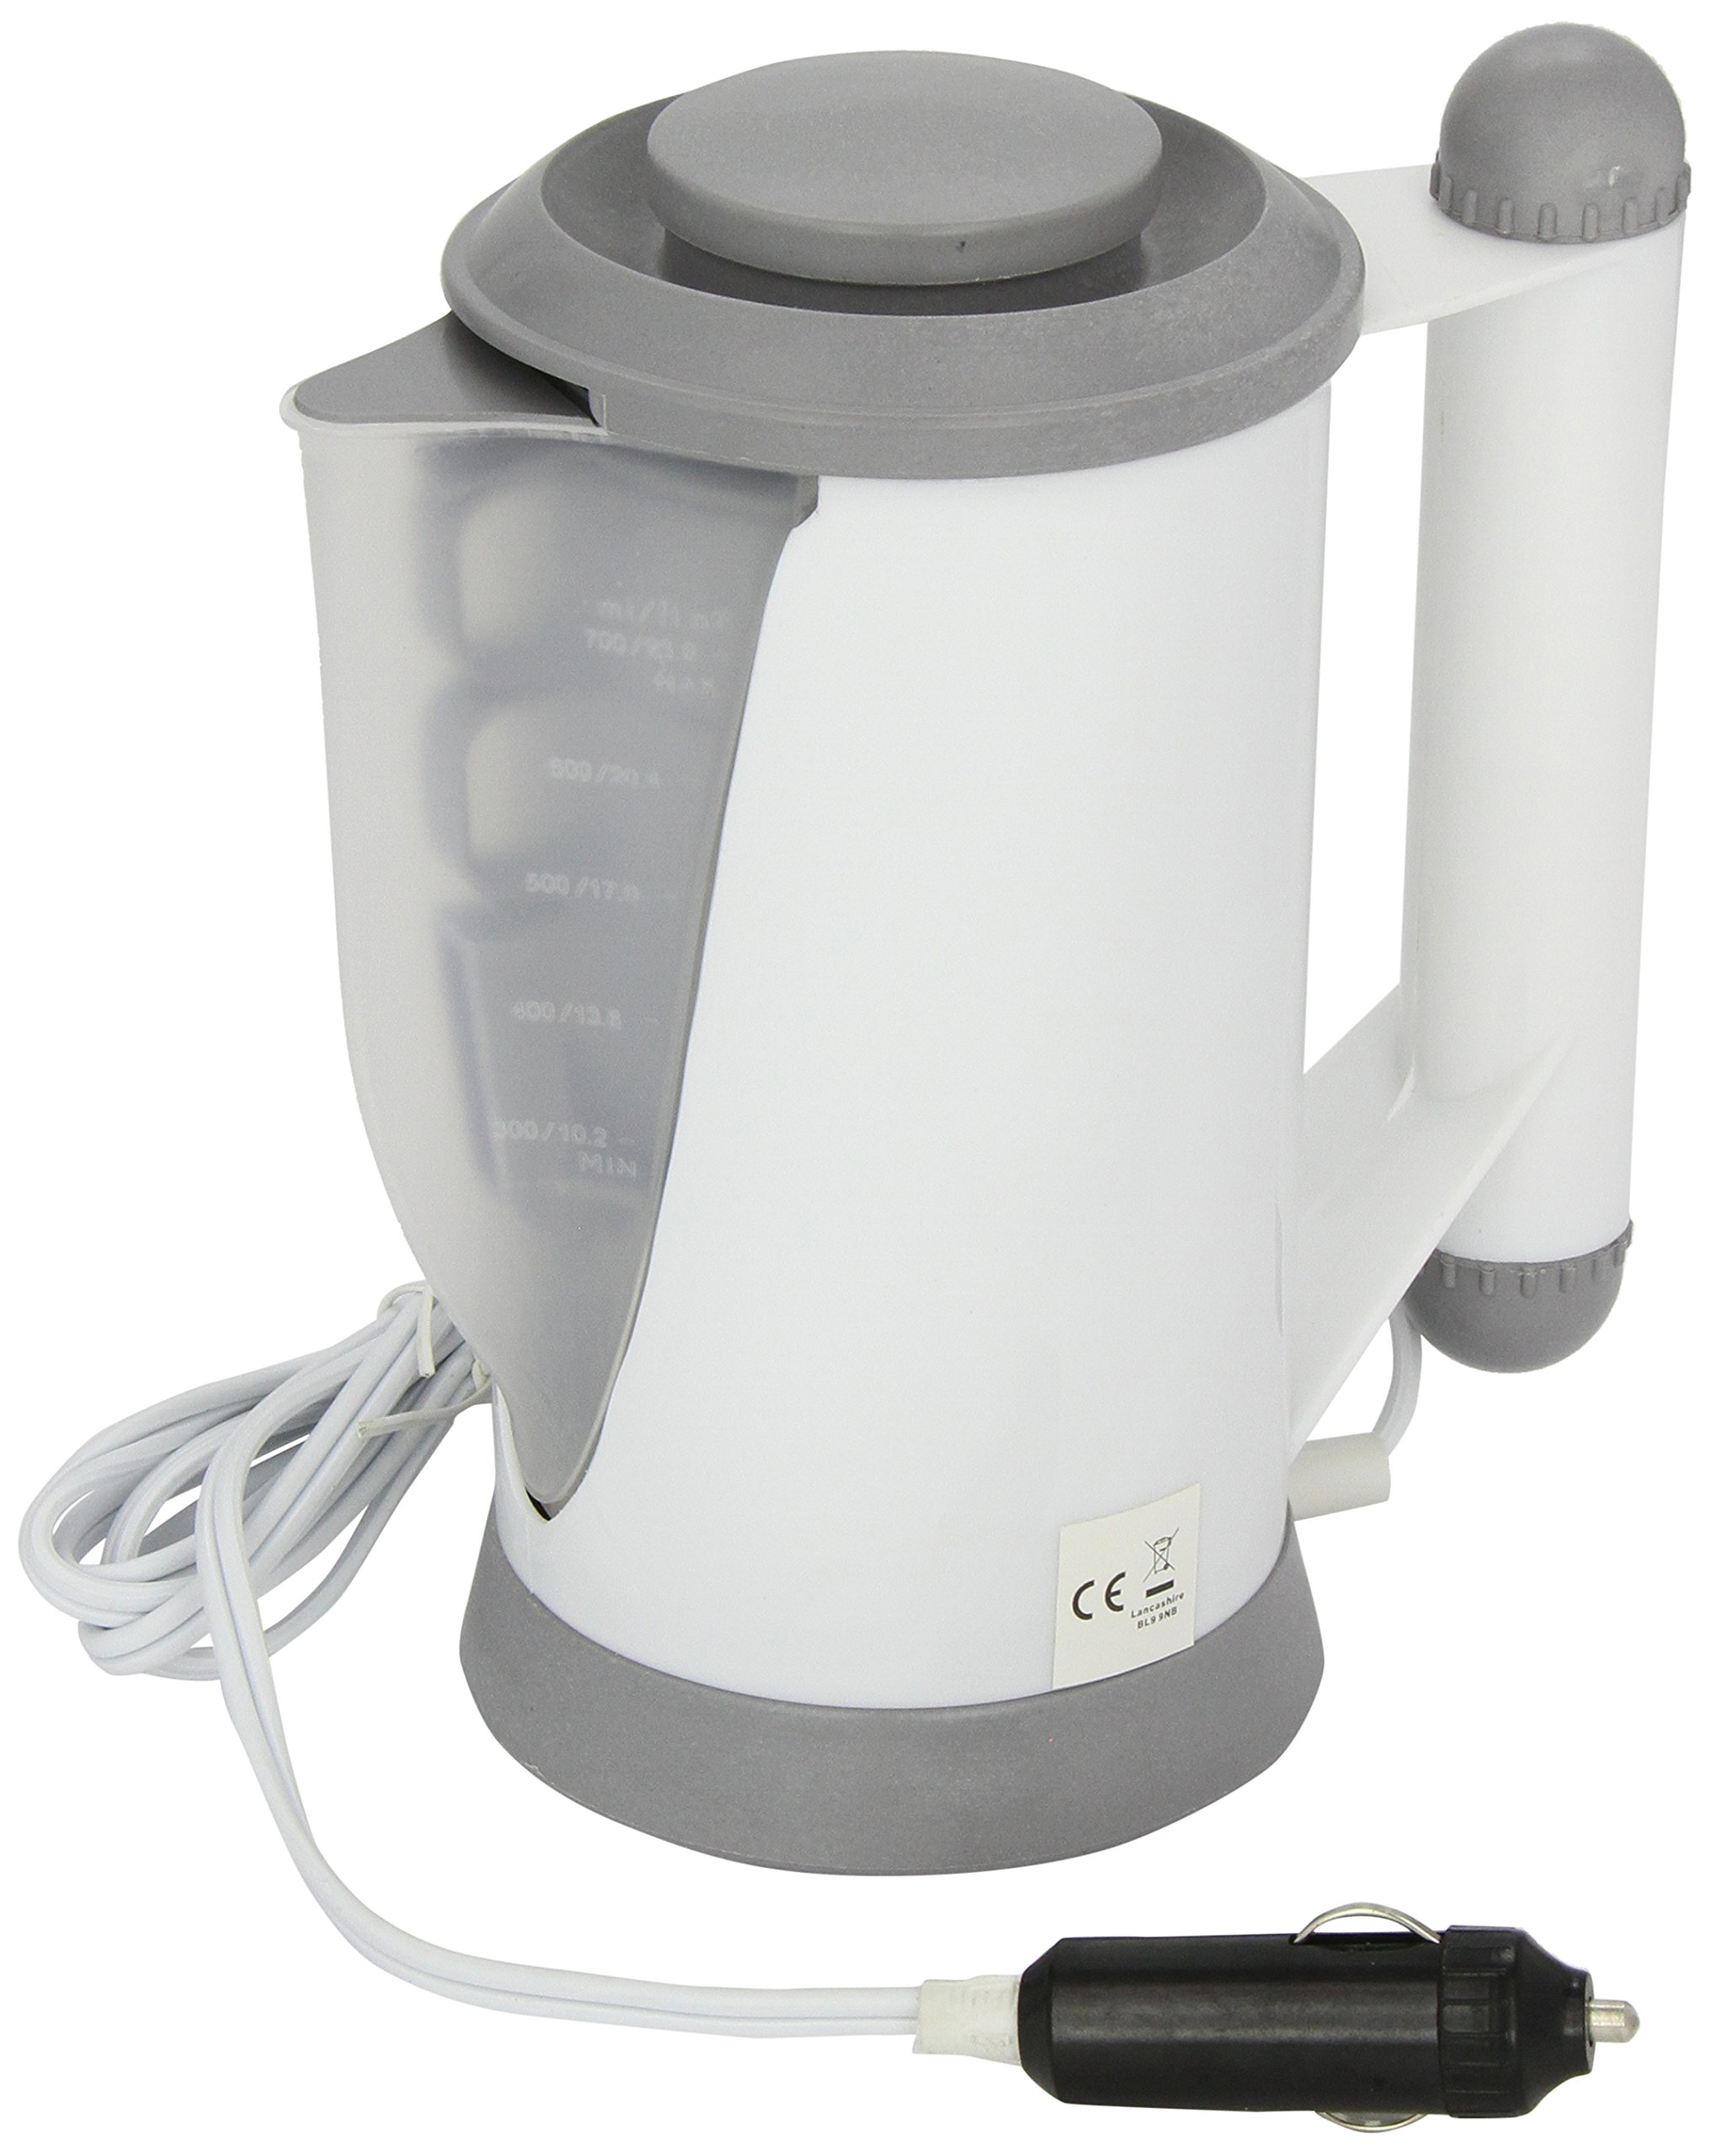 8154VqQCxsL._SR500500_ 12 volt kettle amazon co uk